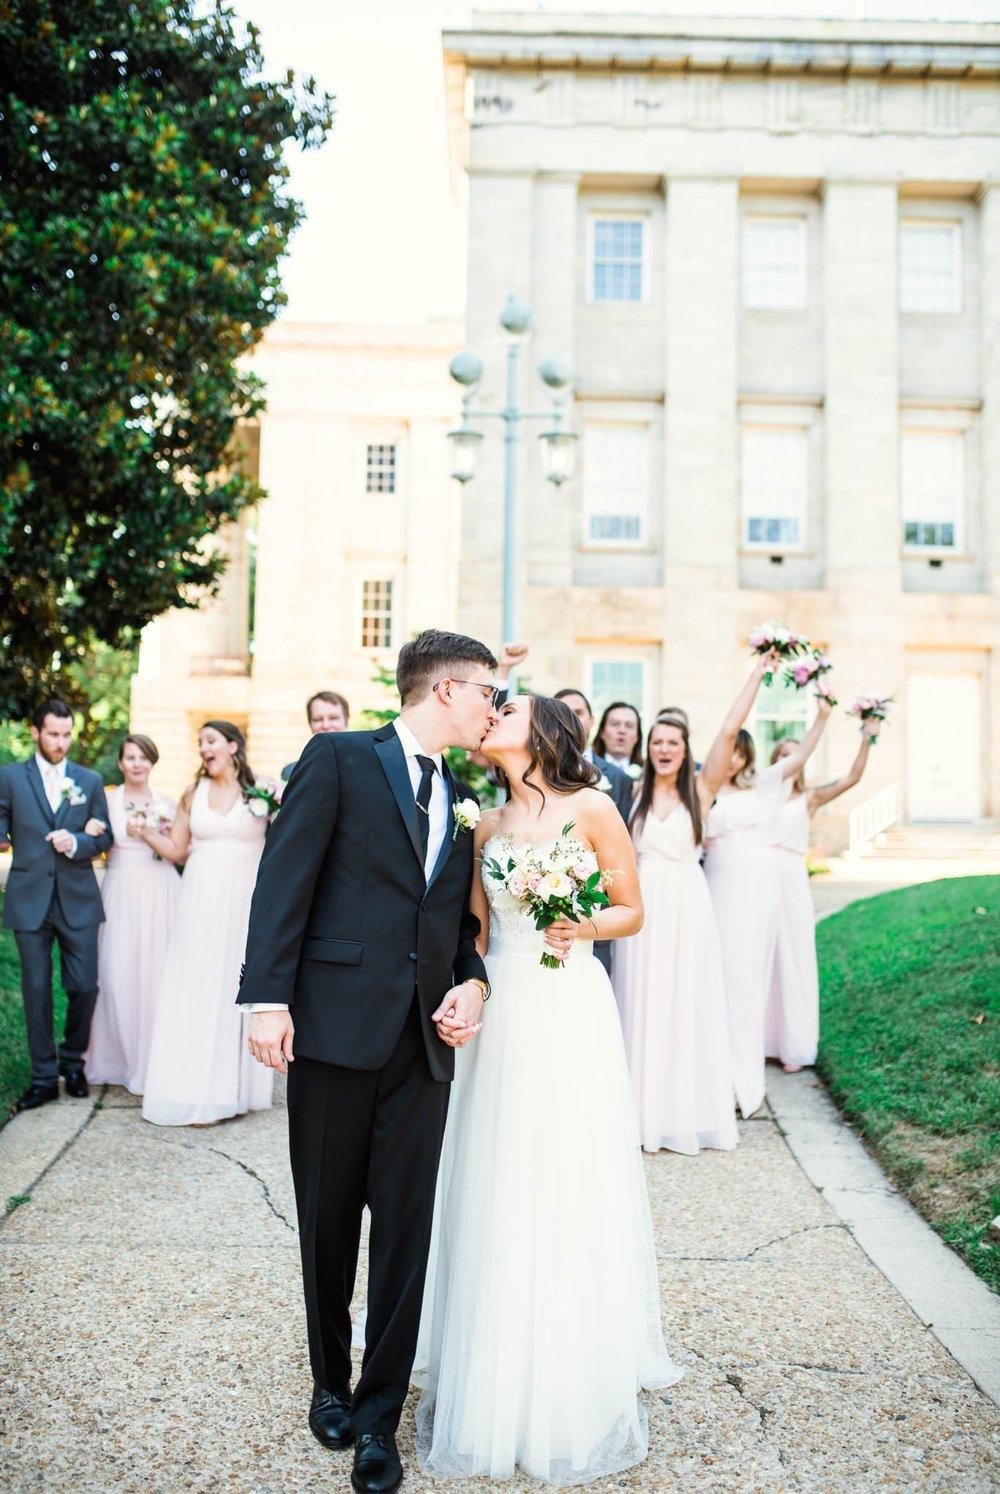 Elizabeth + Kane - Wedding at the Stockroom at 230 - Raleigh North Carolina Wedding Photographer 10.jpg